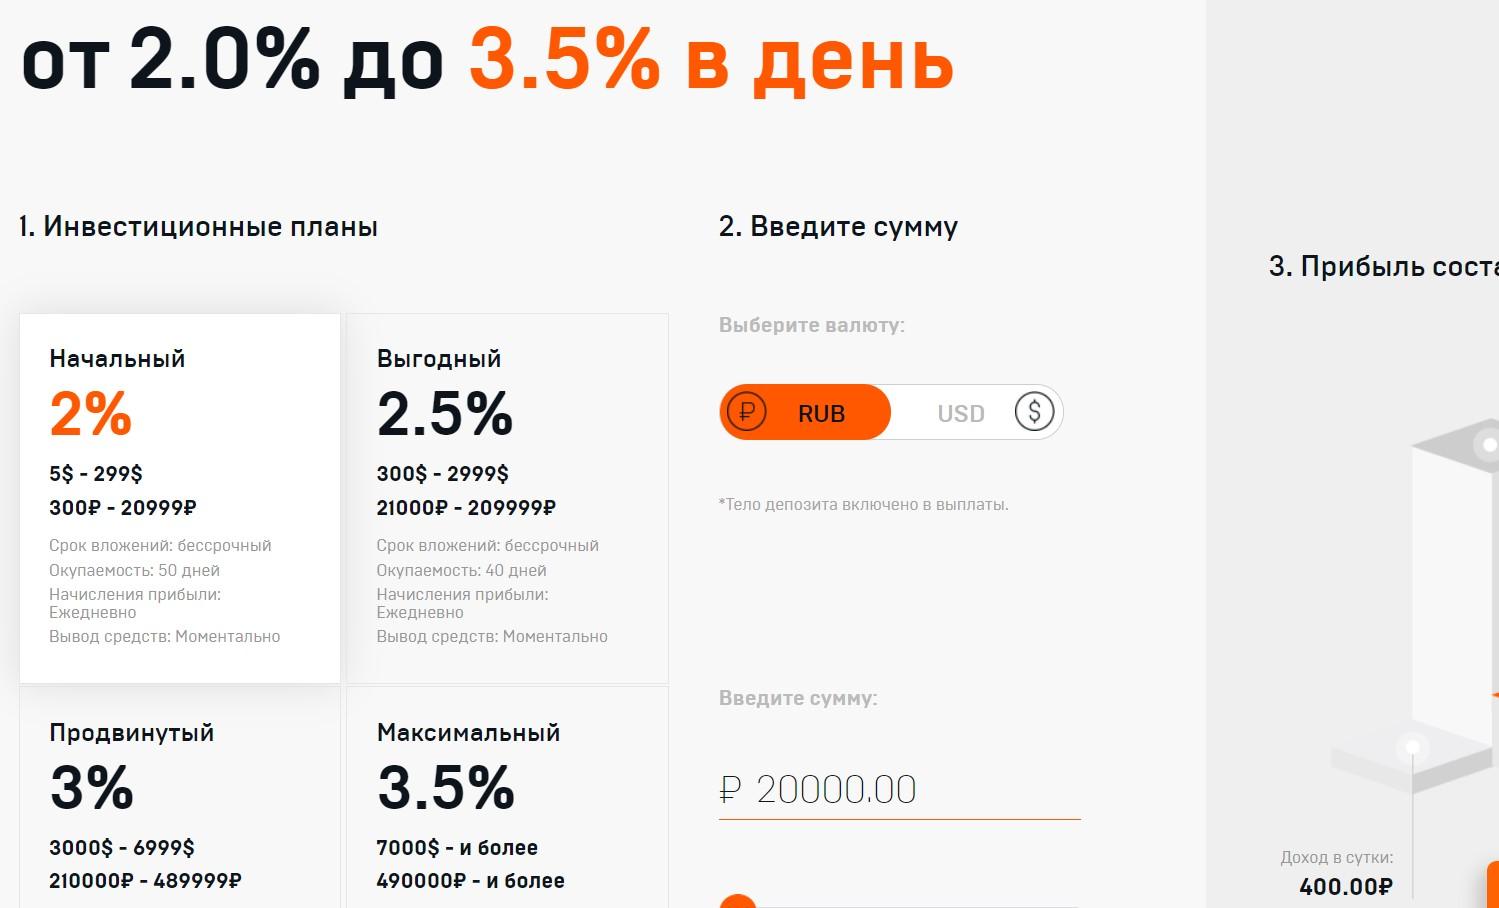 uni-finance.net правда